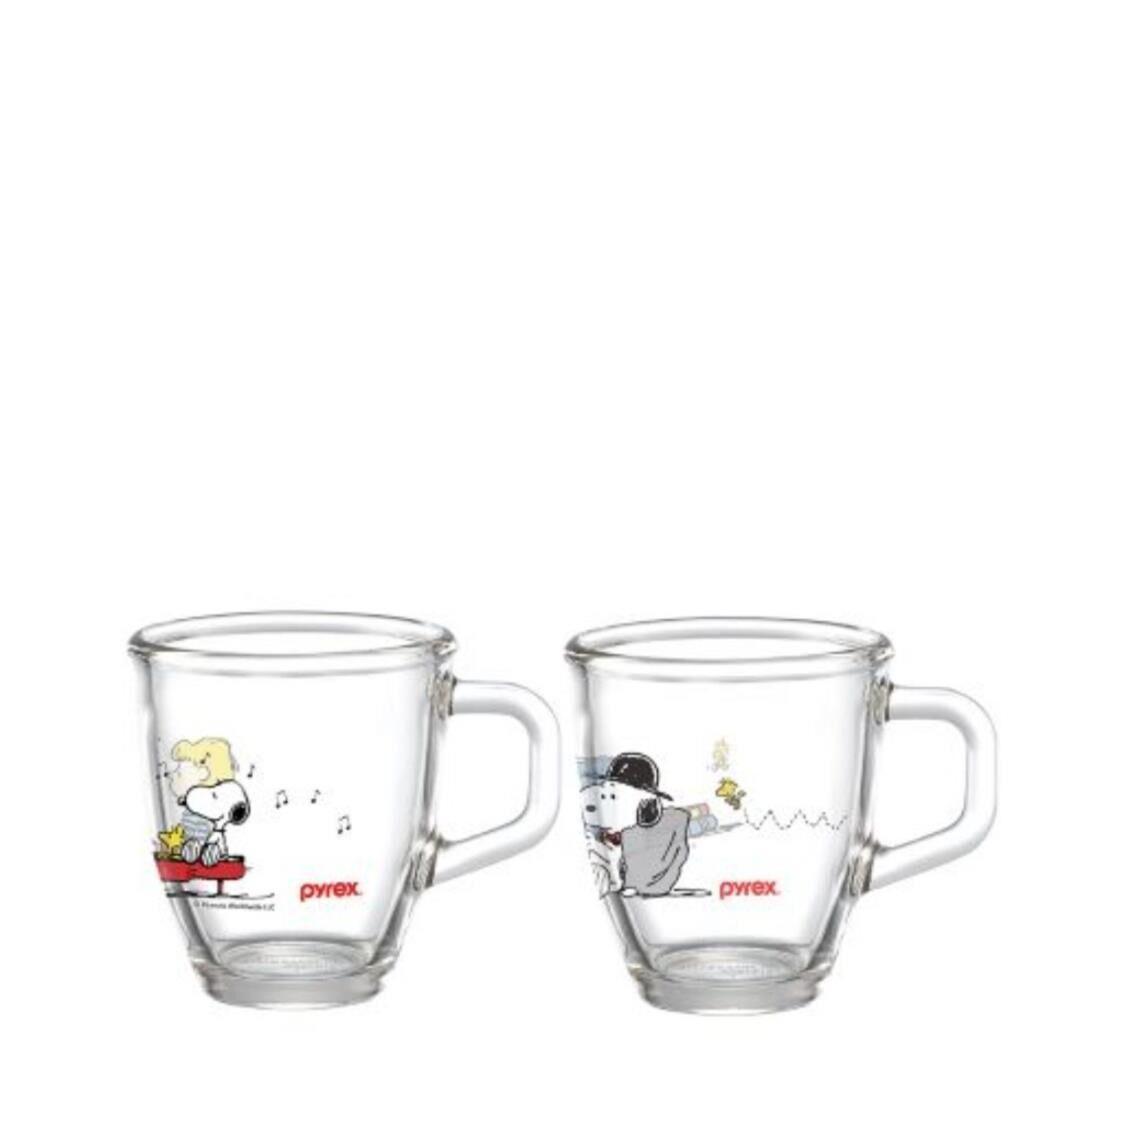 Pyrex Mug Set 2pc 375ml - Snoopy Colourful